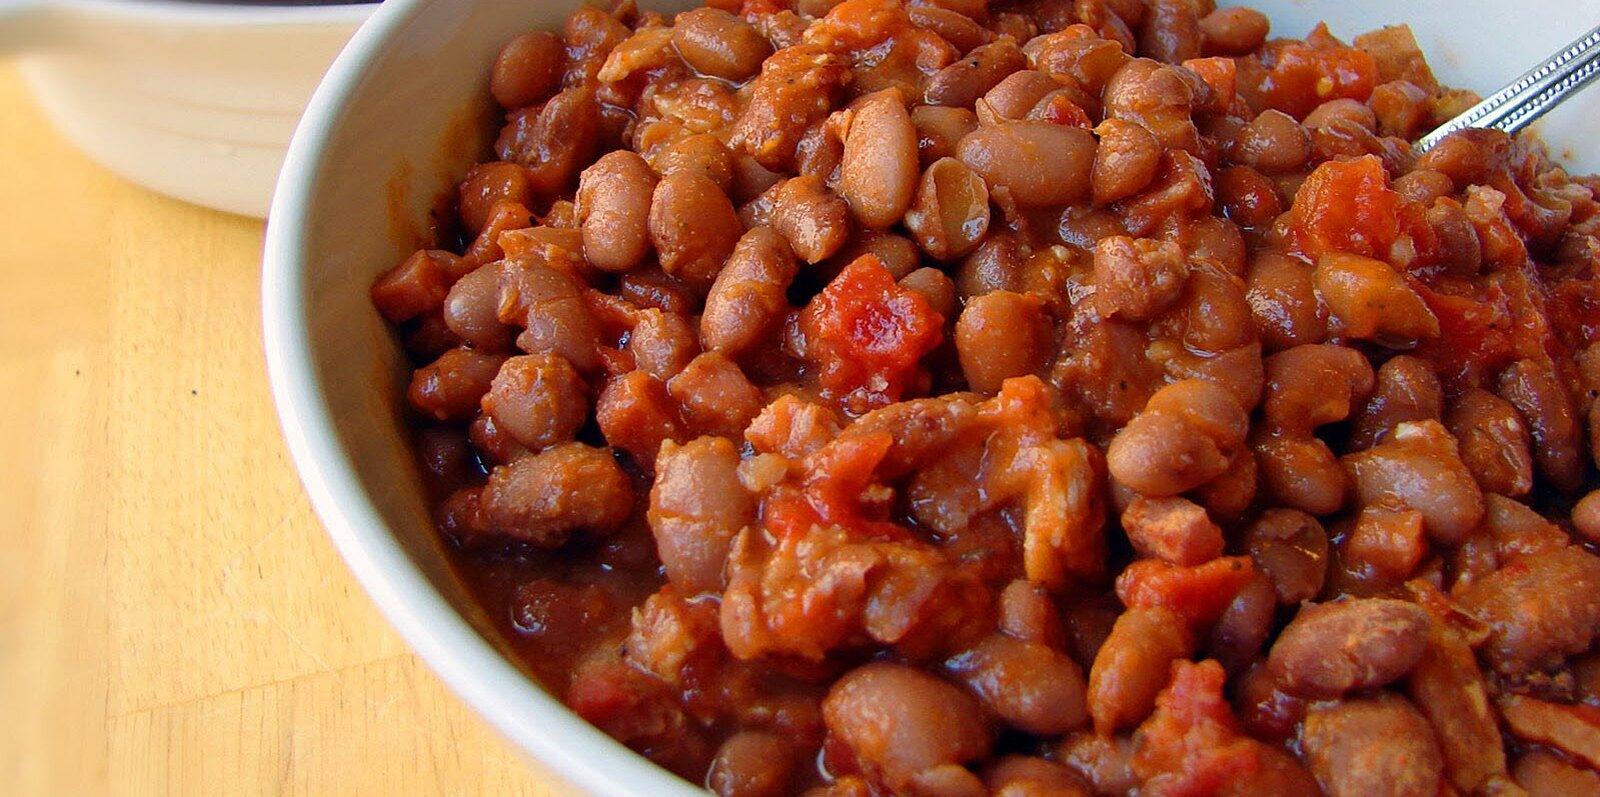 chef johns santa maria style beans